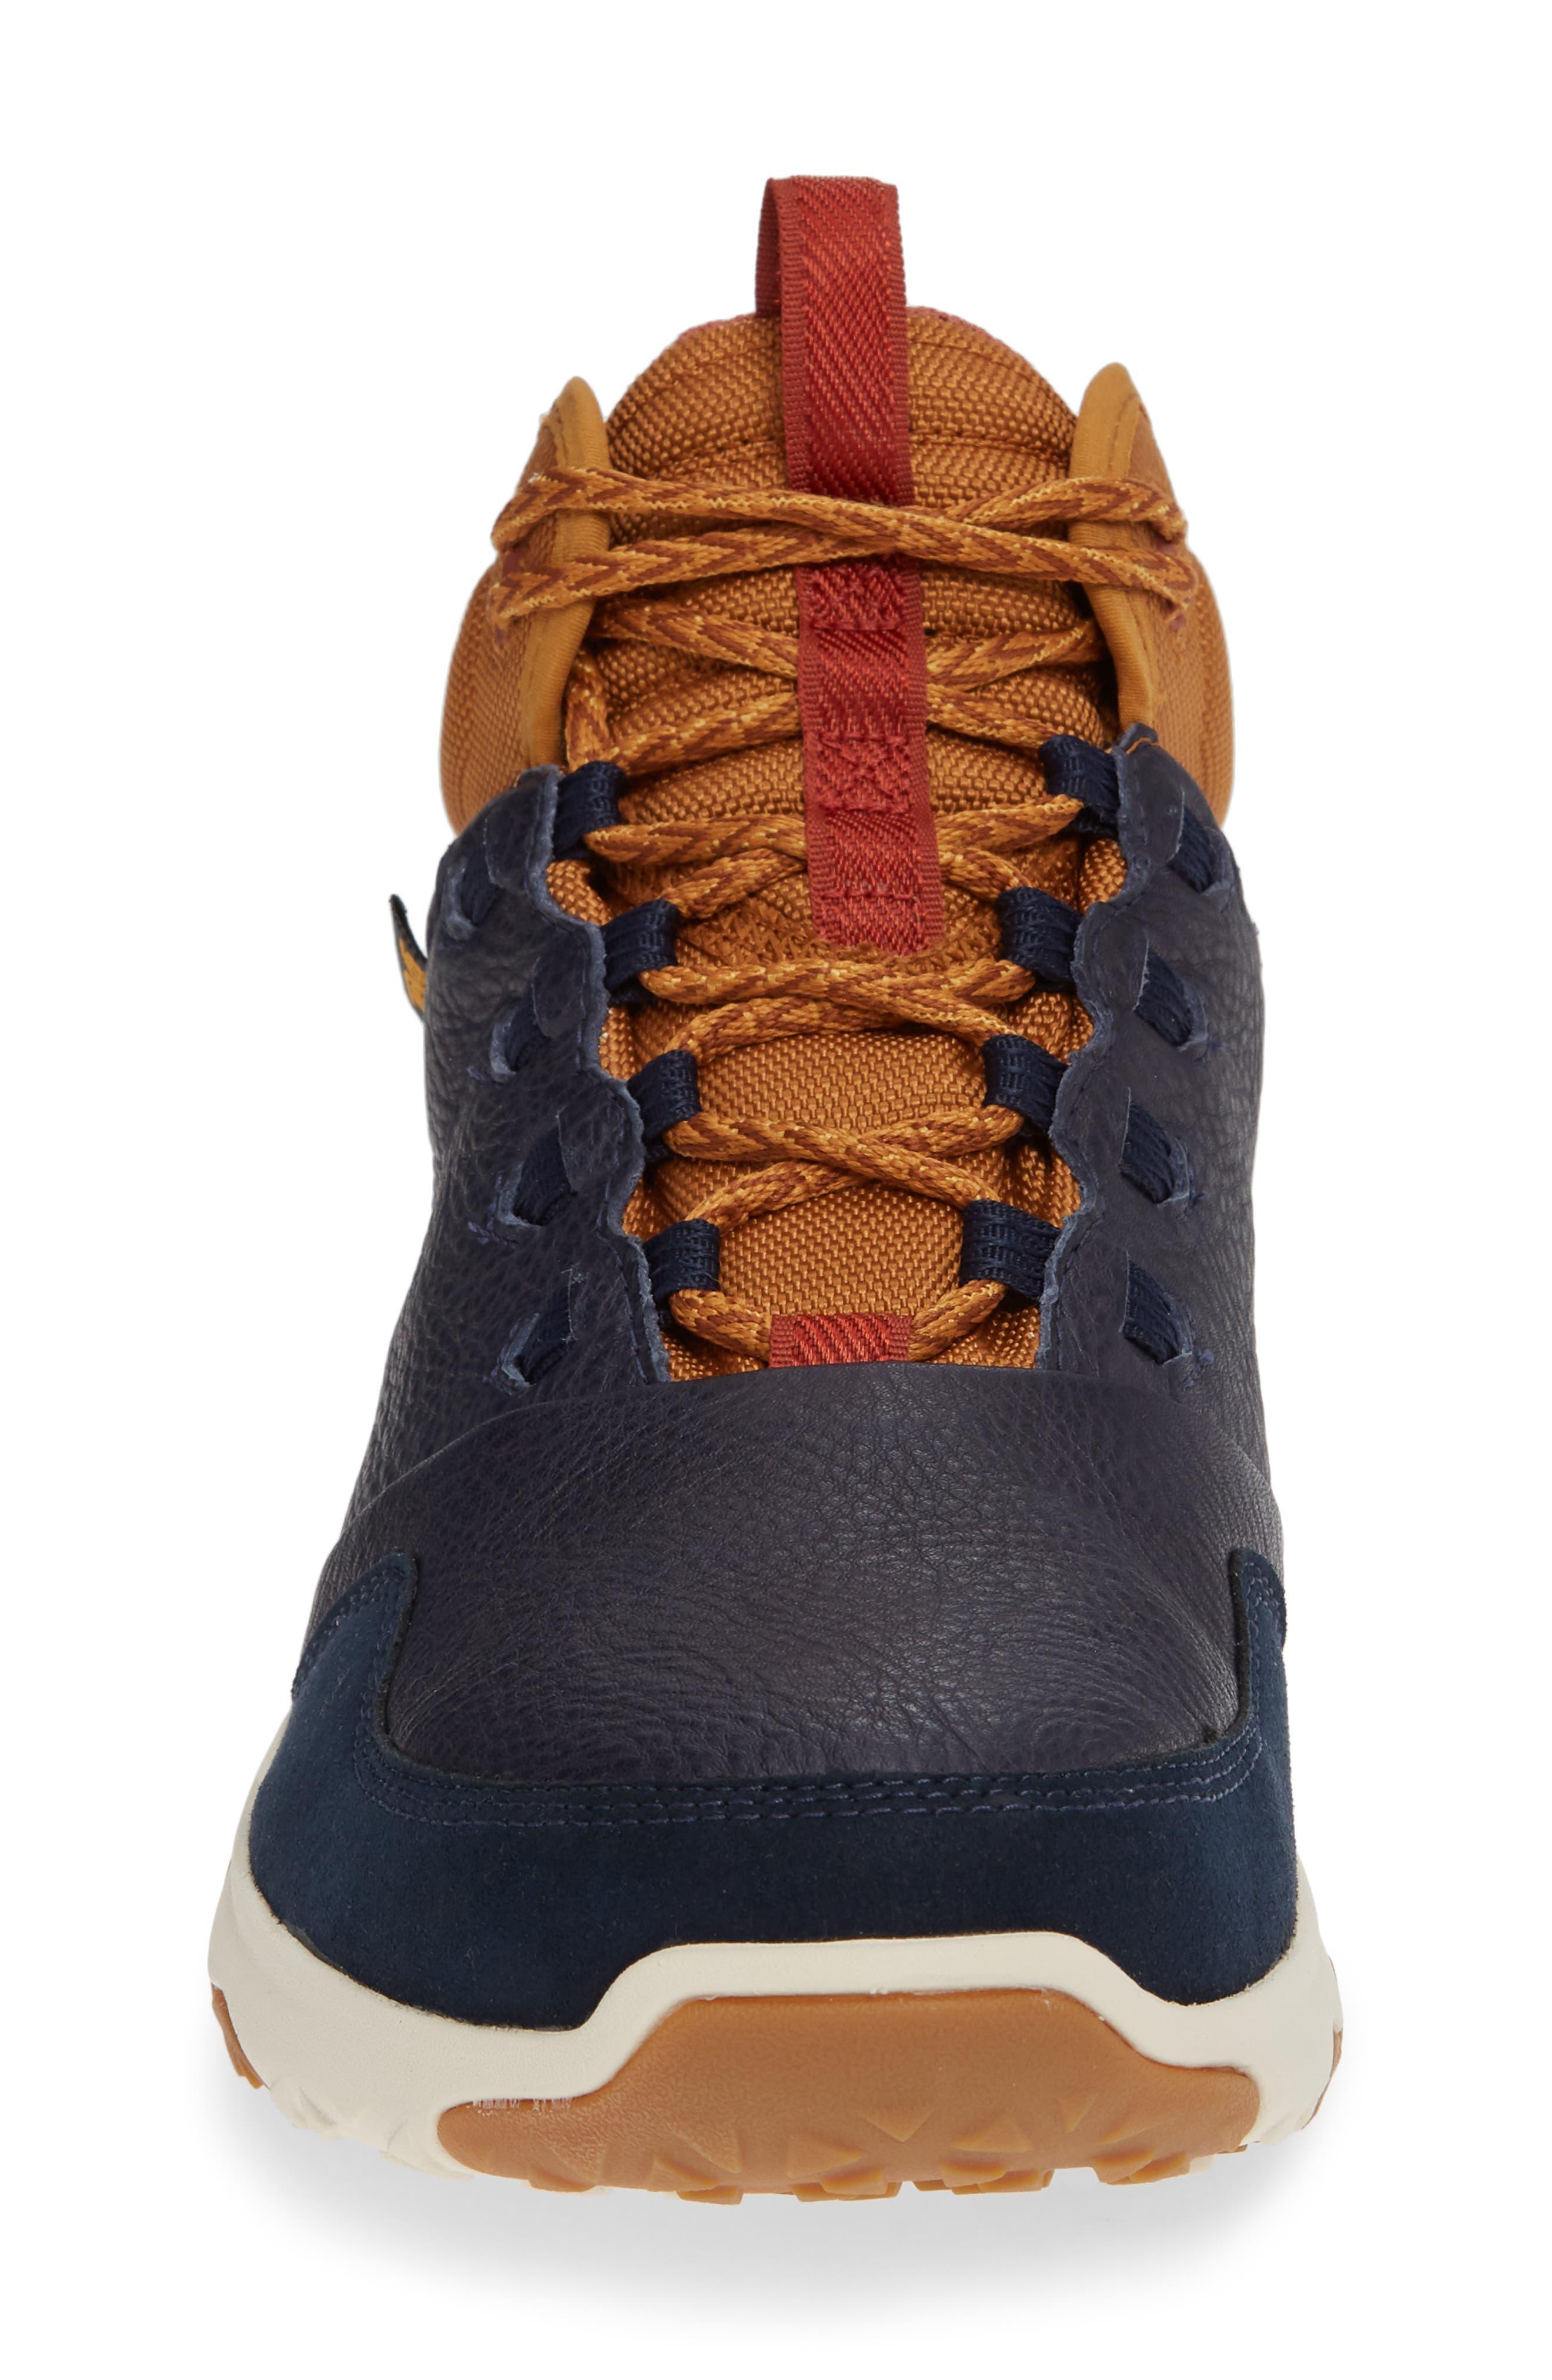 Arrowood 2 Mid Waterproof Sneaker Boot,                             Alternate thumbnail 4, color,                             MIDNIGHT NAVY LEATHER